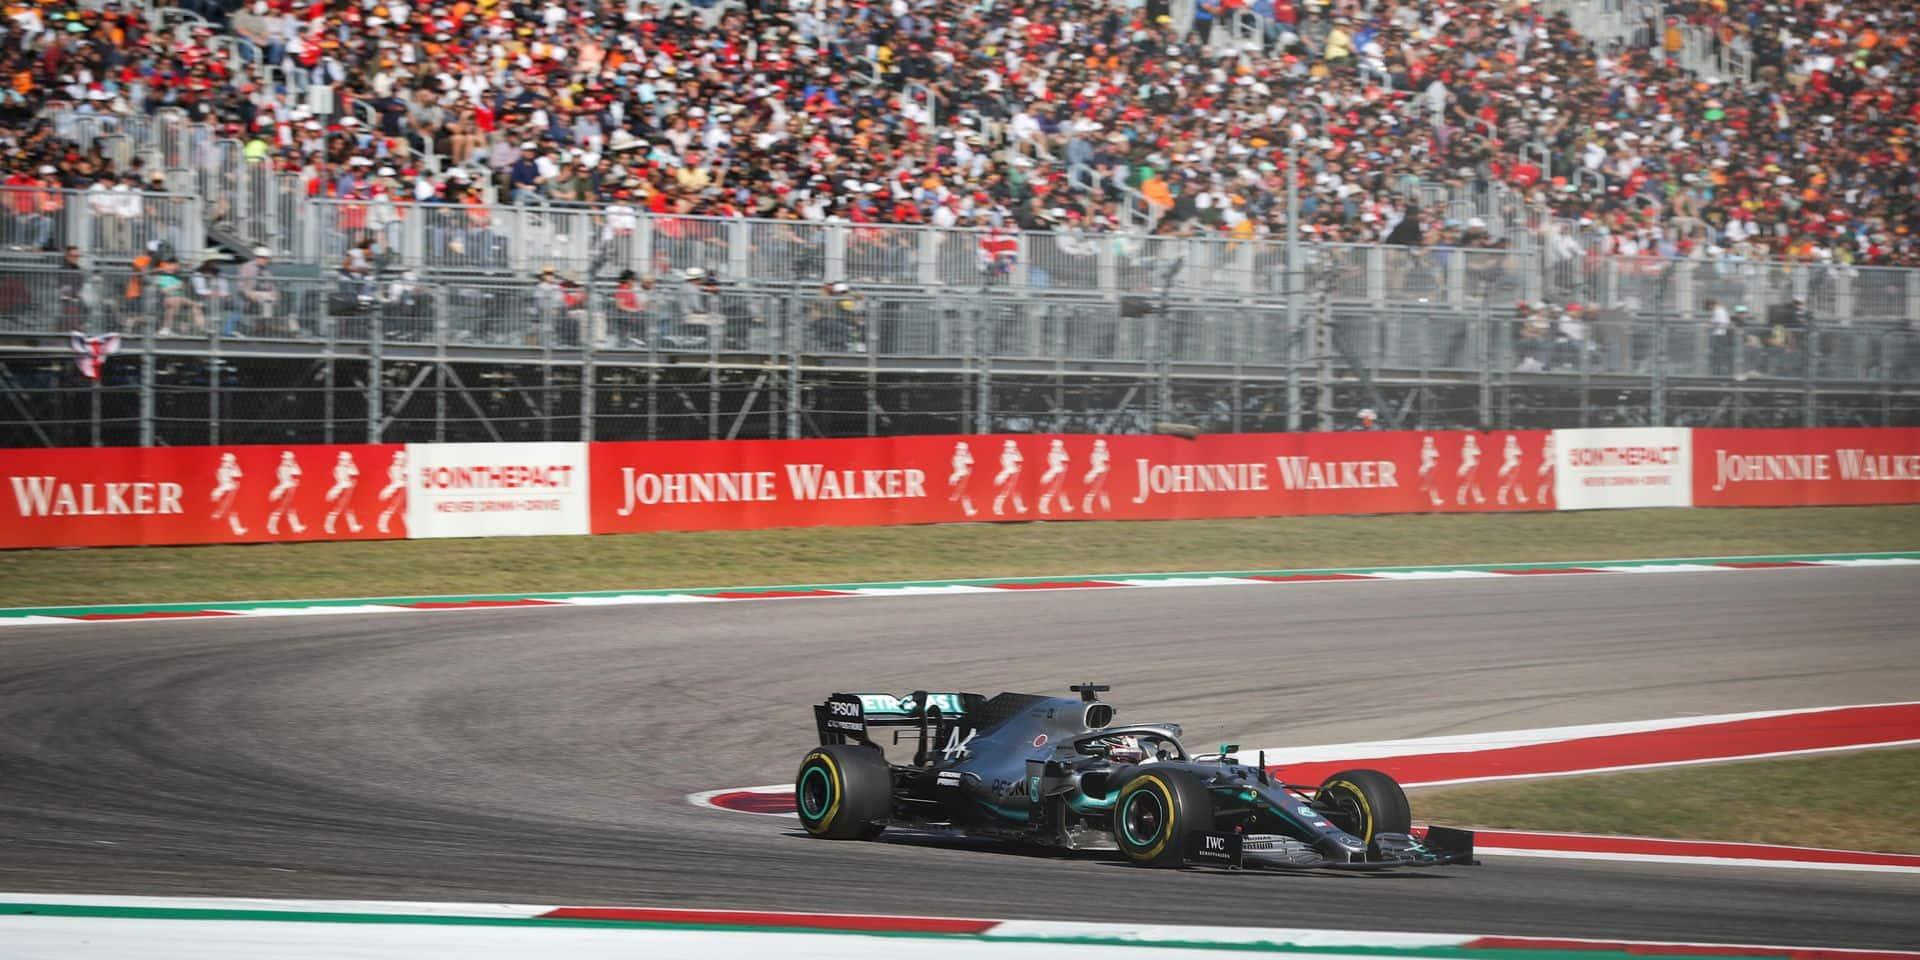 L'Autre Regard: La F1 justifie les moyens